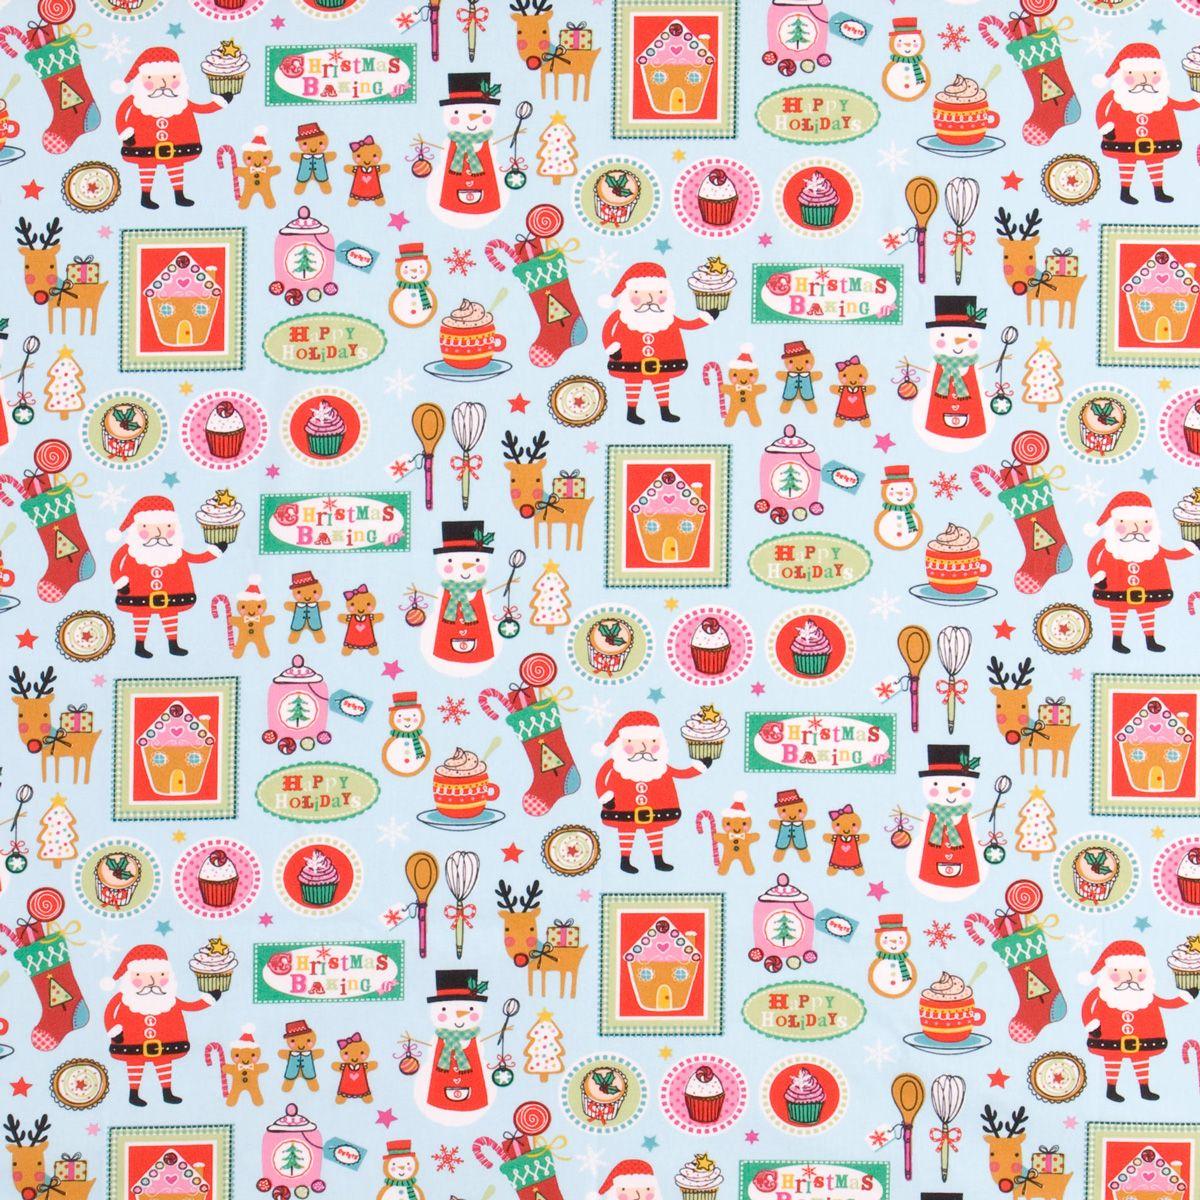 Christmas Bake Curtain Fabric Aqua   Cheap Printed Fabric ...